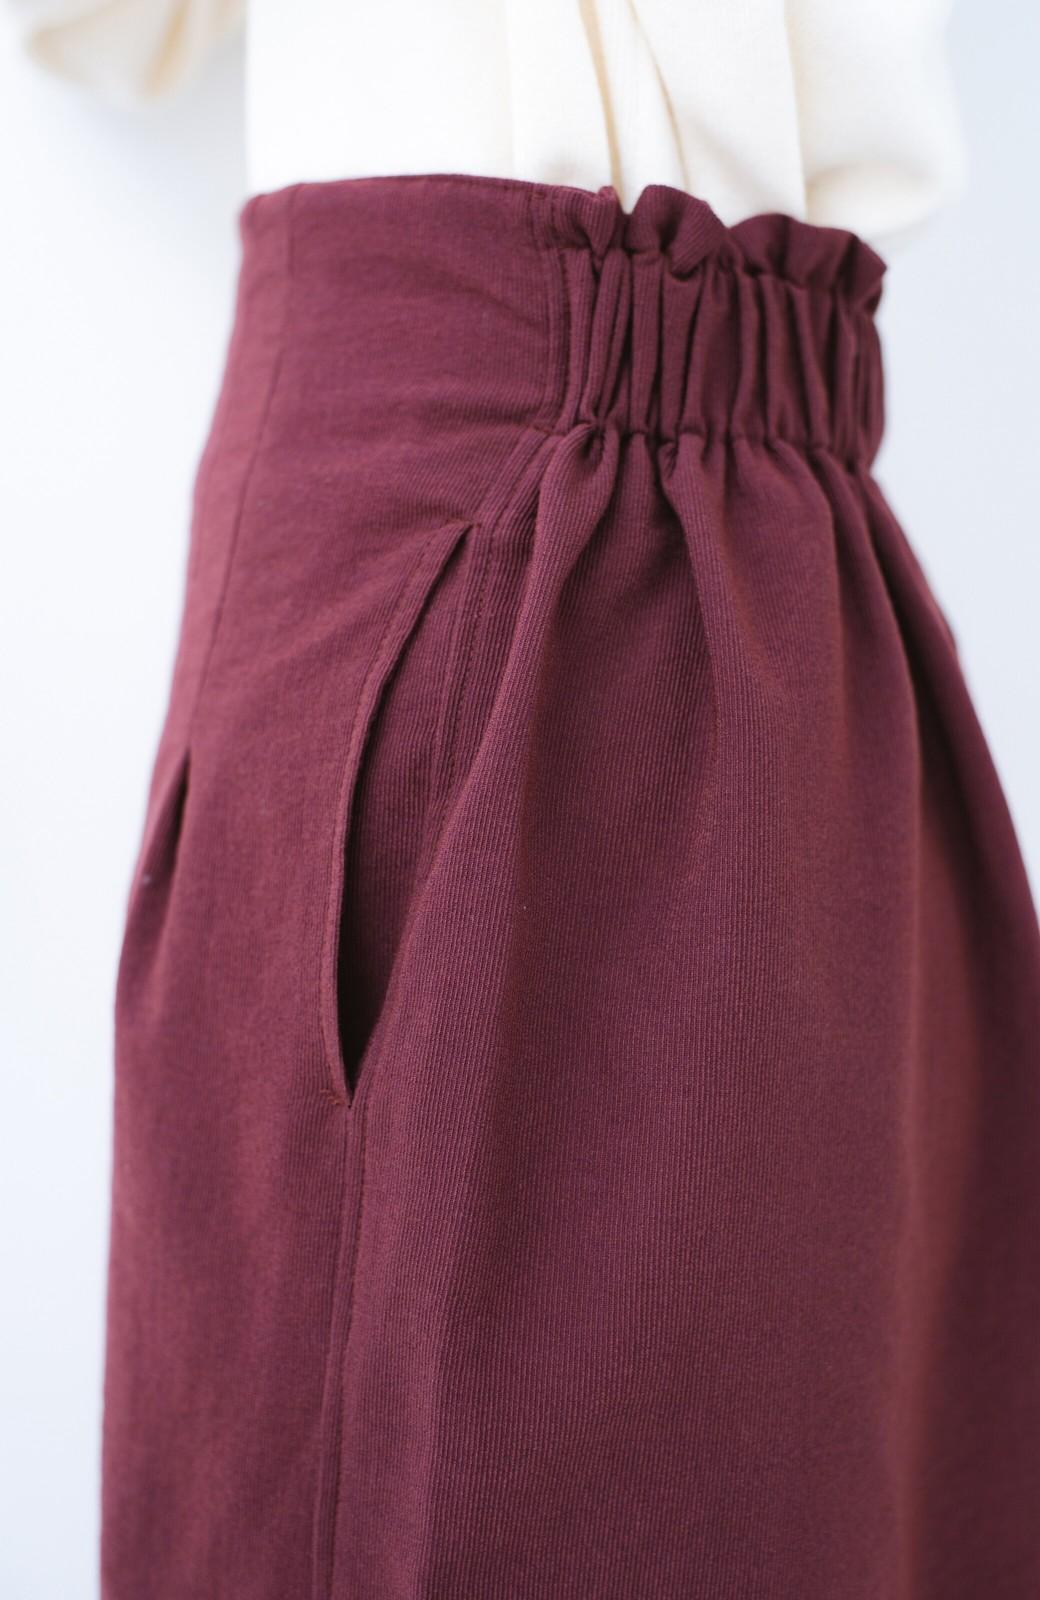 haco!  腹巻きとは呼ばせない ブルー期も華やかに過ごせる消臭加工裏地付きフリルデザインスカートセット【ブルー期】女の子バンザイ!プロジェクト <ボルドー>の商品写真17